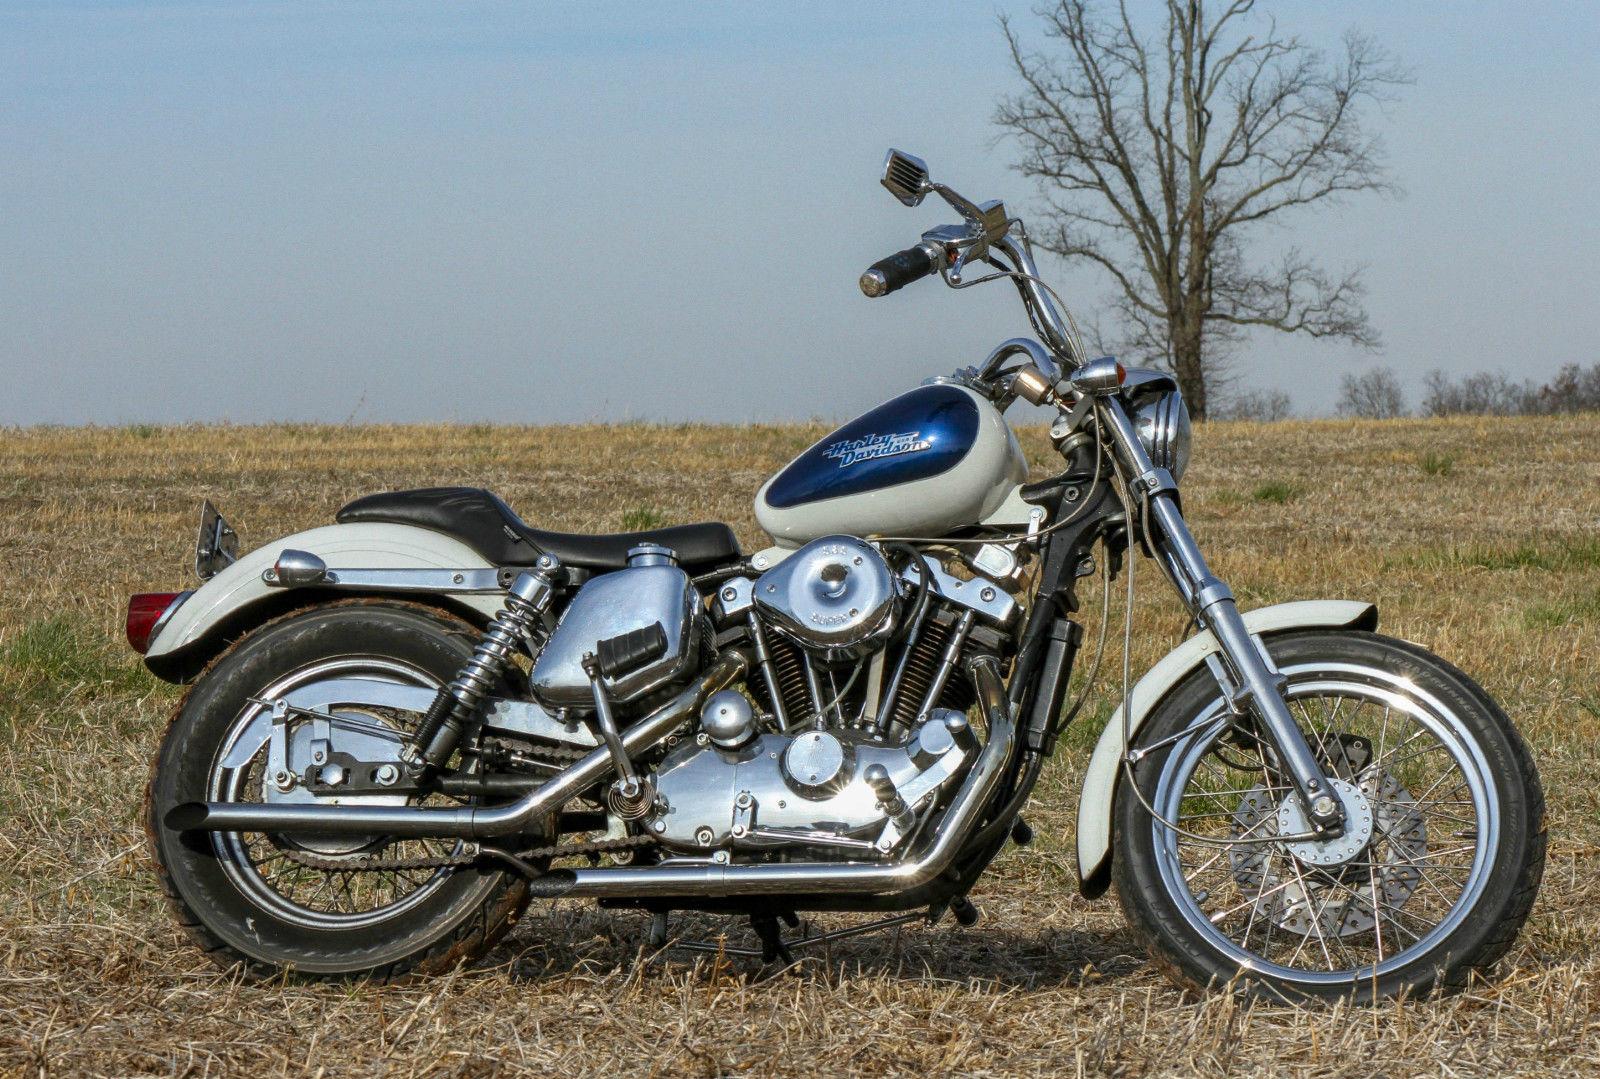 1974 Harley Davidson Xlch Ironhead Sportster